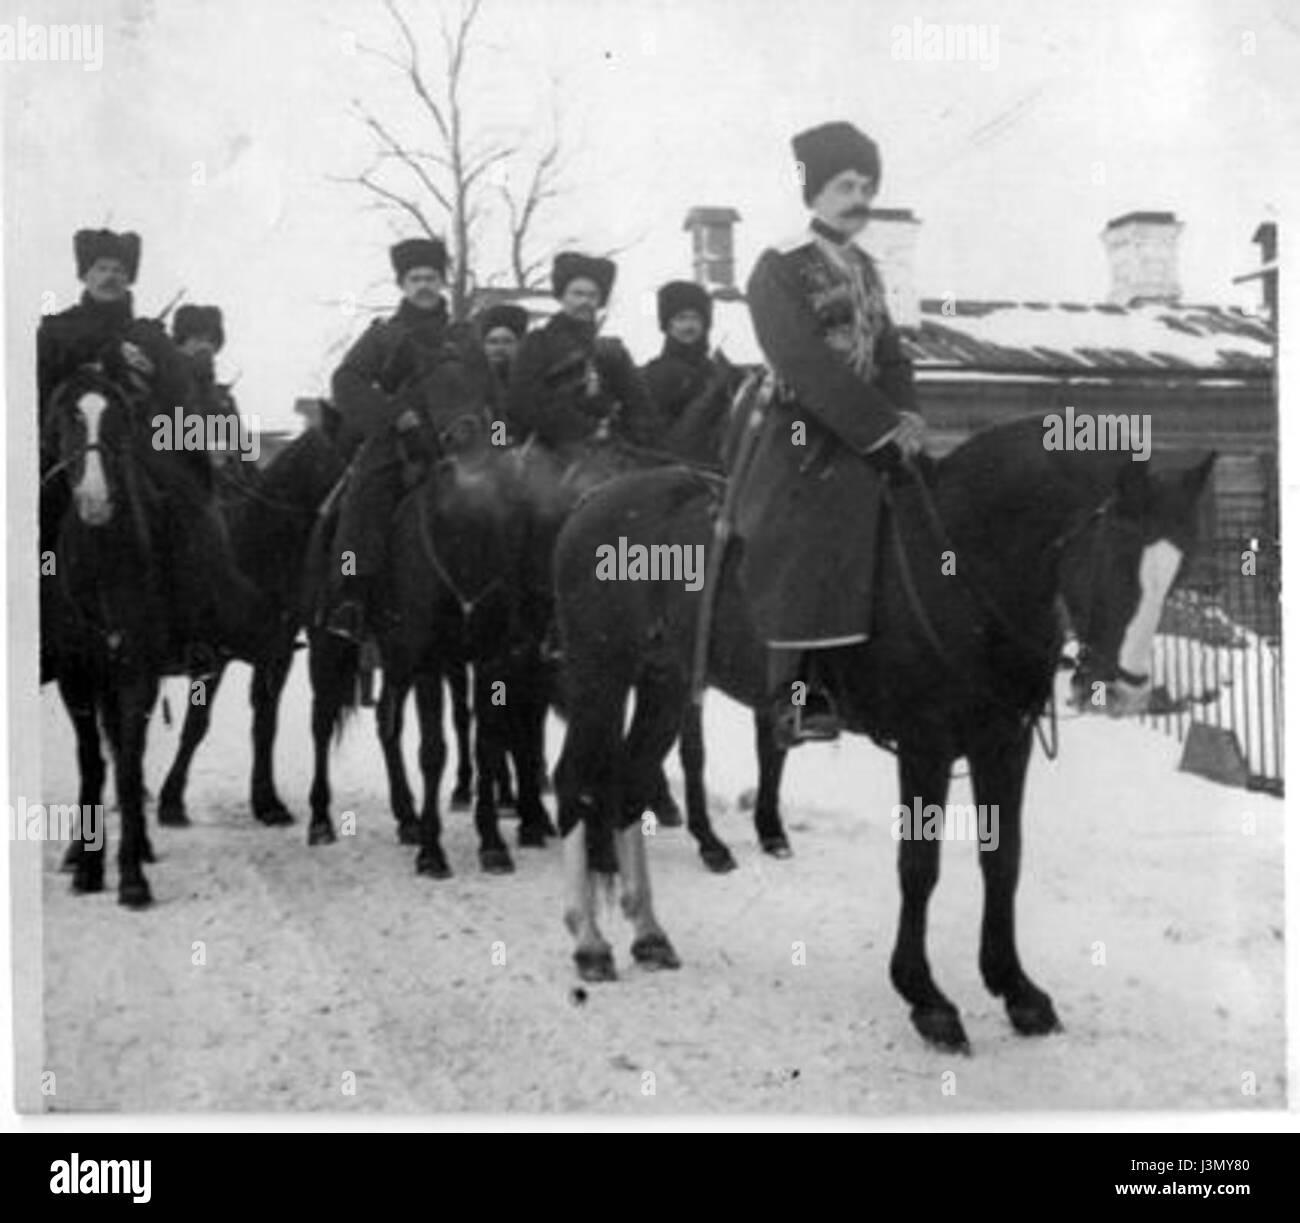 Historical photos of Azerbaijani   12 - Stock Image